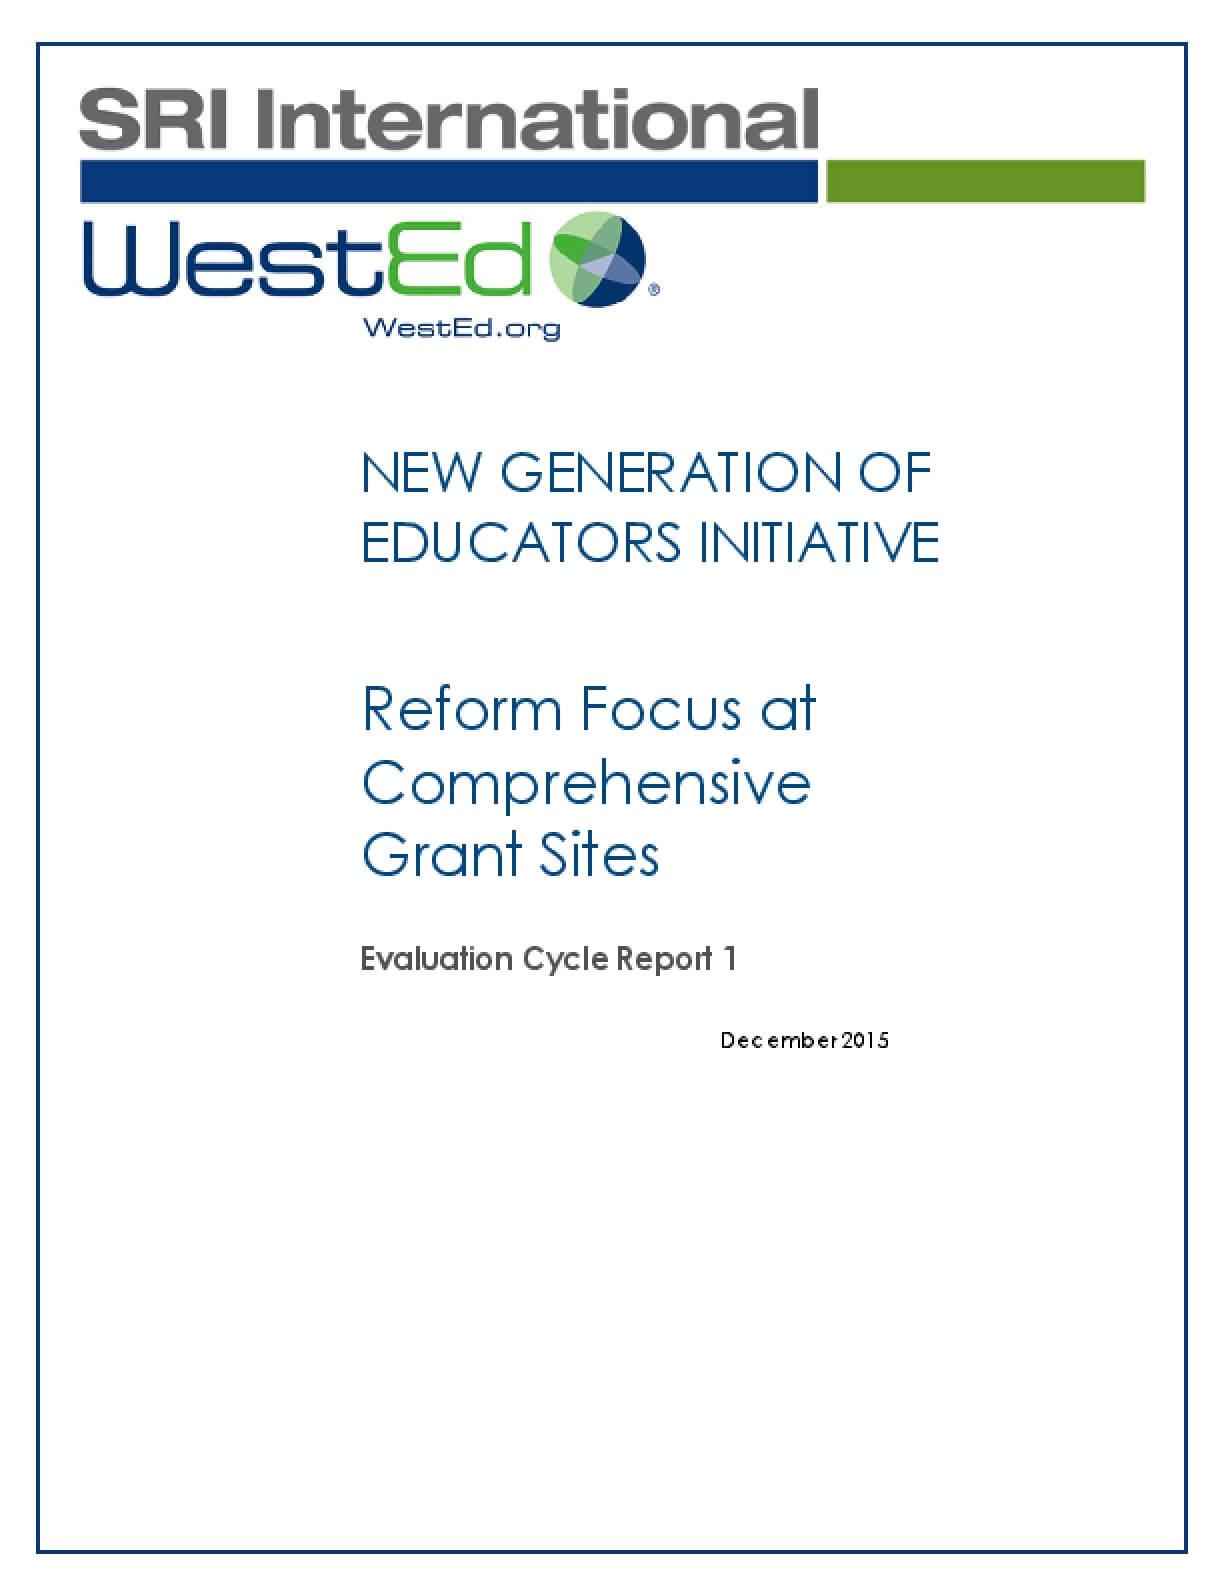 New Generation of Educators Initiative: Reform Focus at Comprehensive Grant Sites